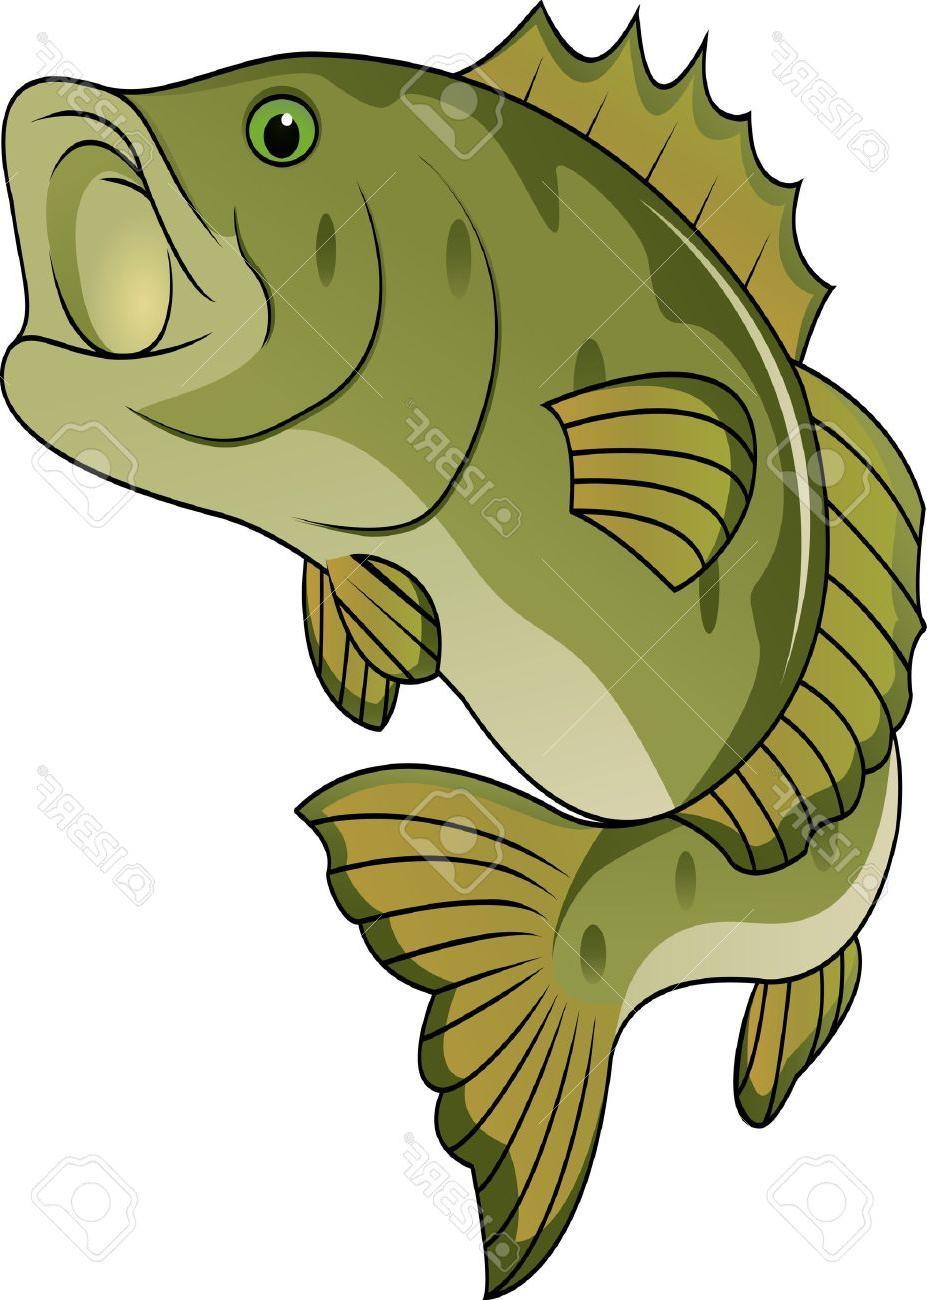 927x1300 Unique Funny Fish Cartoon Stock Vector Bass Fishing Images